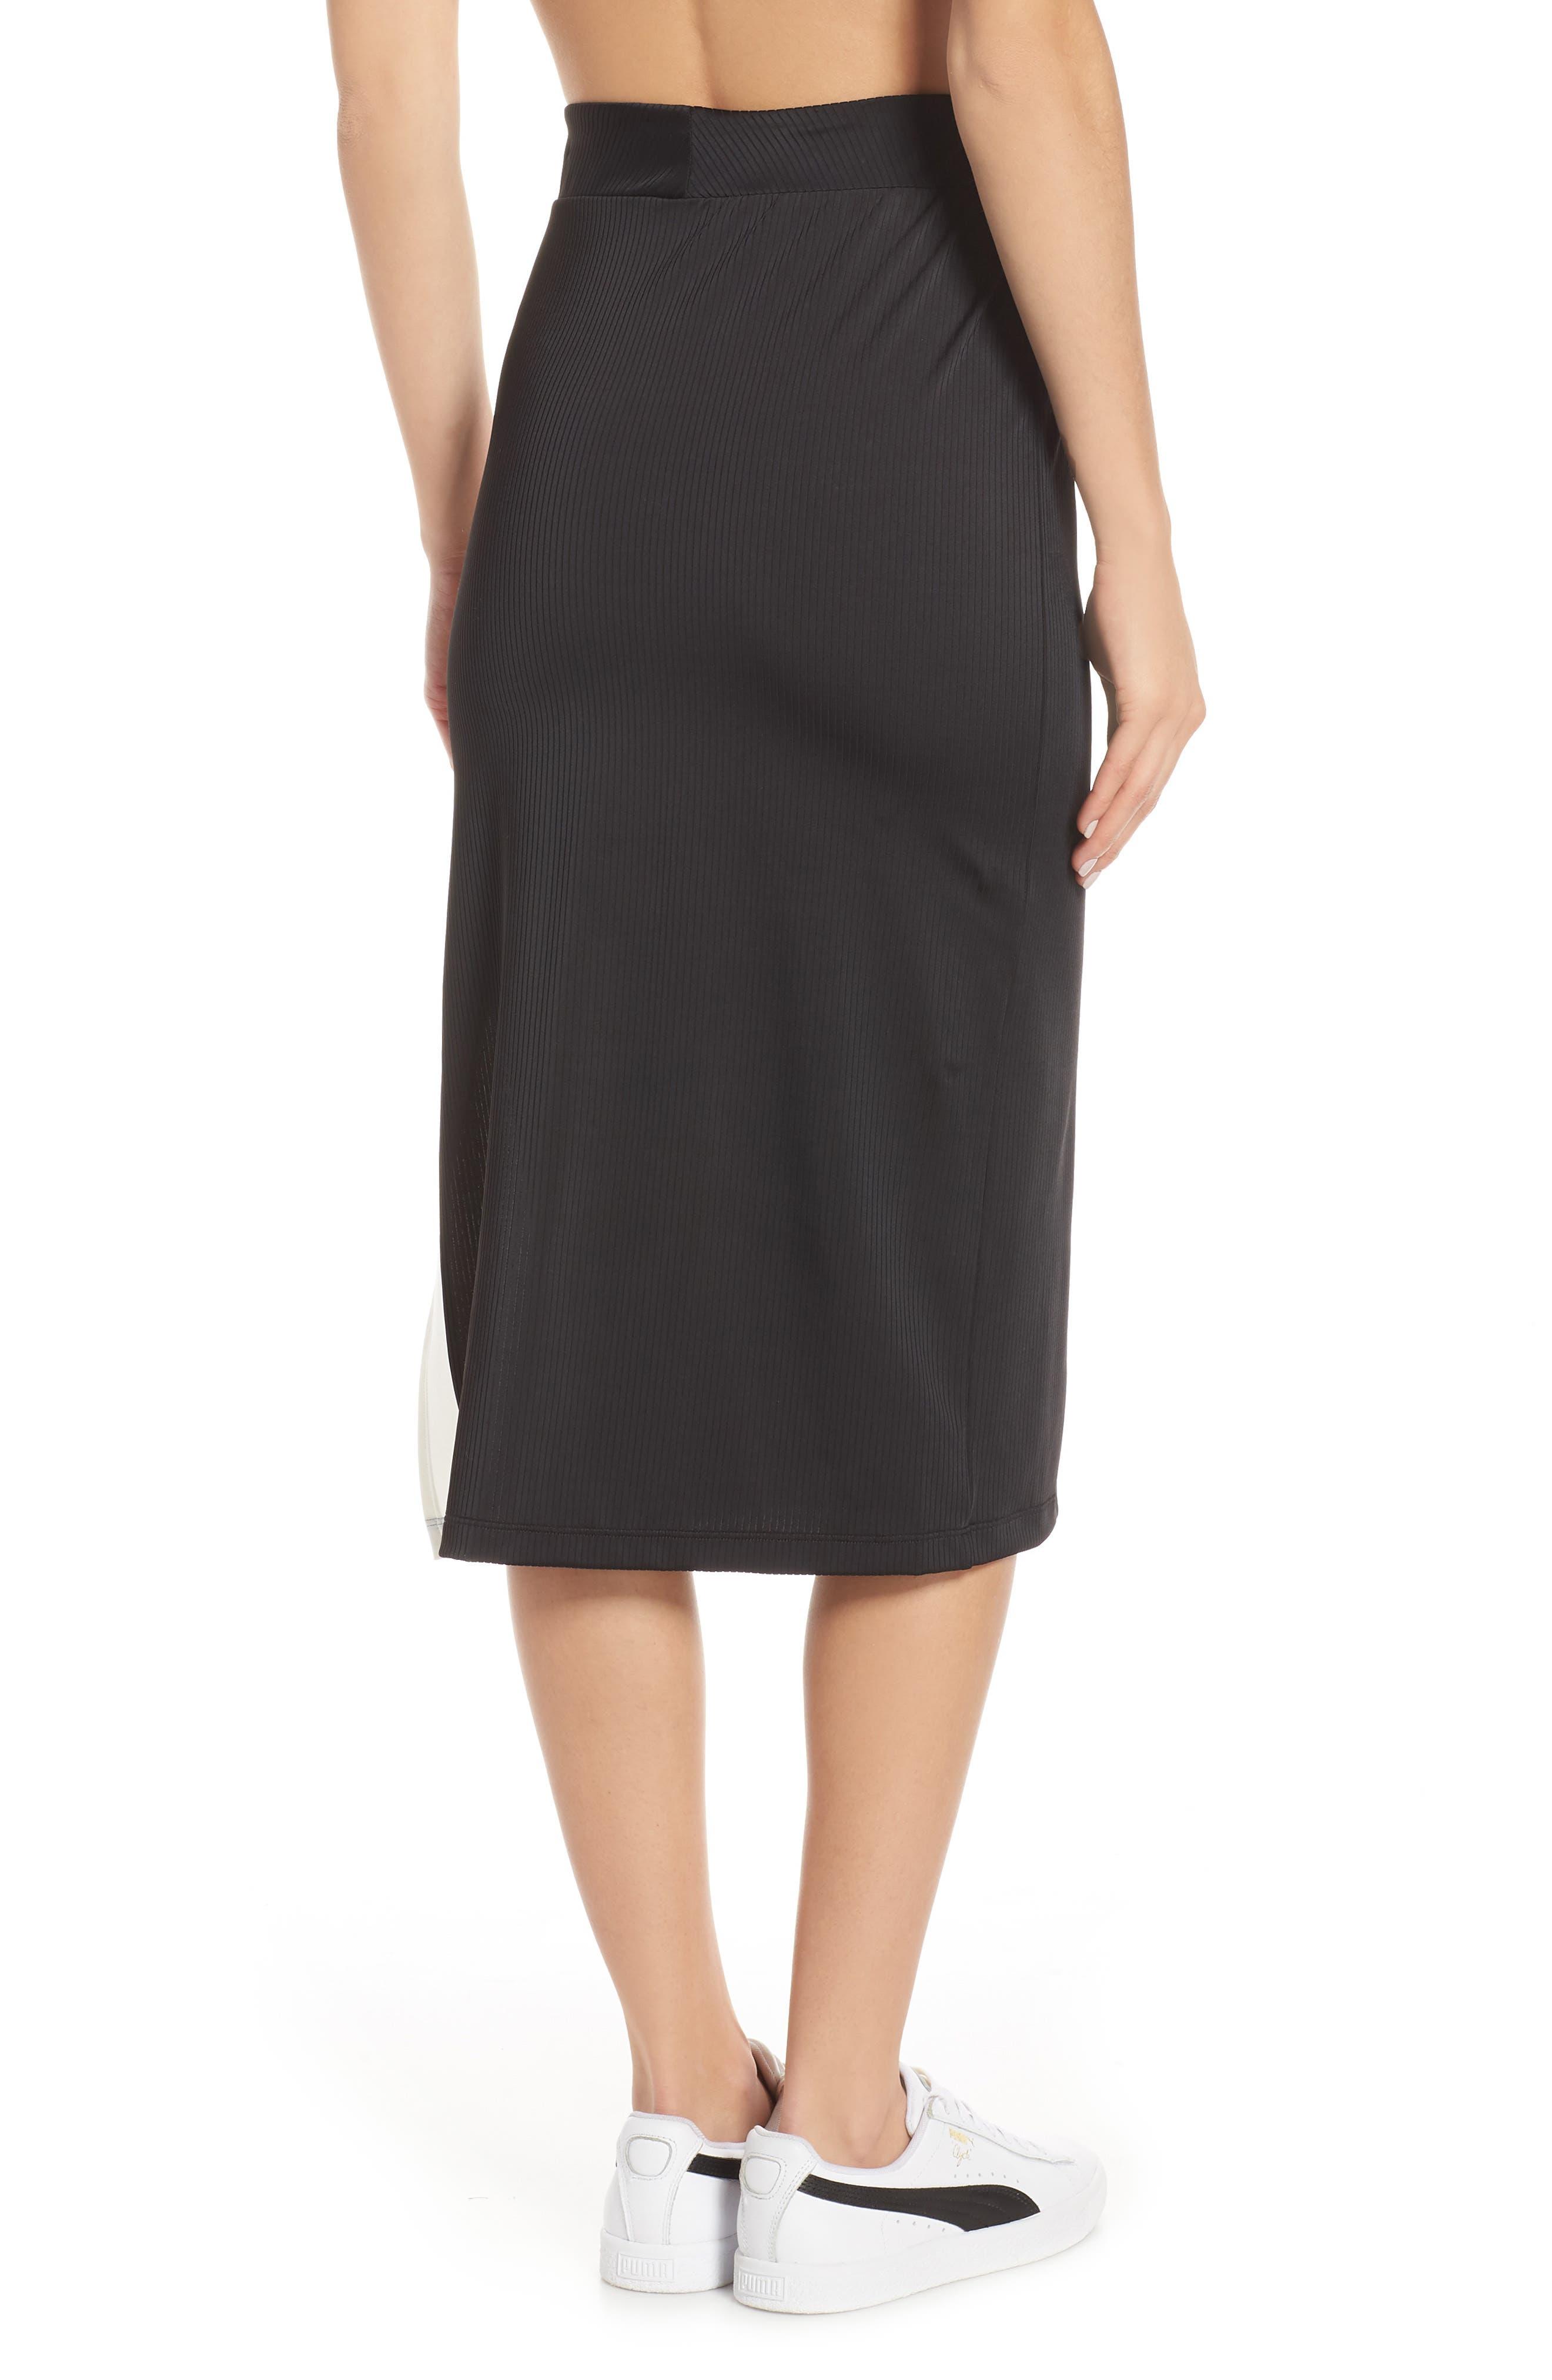 PUMA,                             Classics Ribbed Skirt,                             Alternate thumbnail 2, color,                             PUMA BLACK